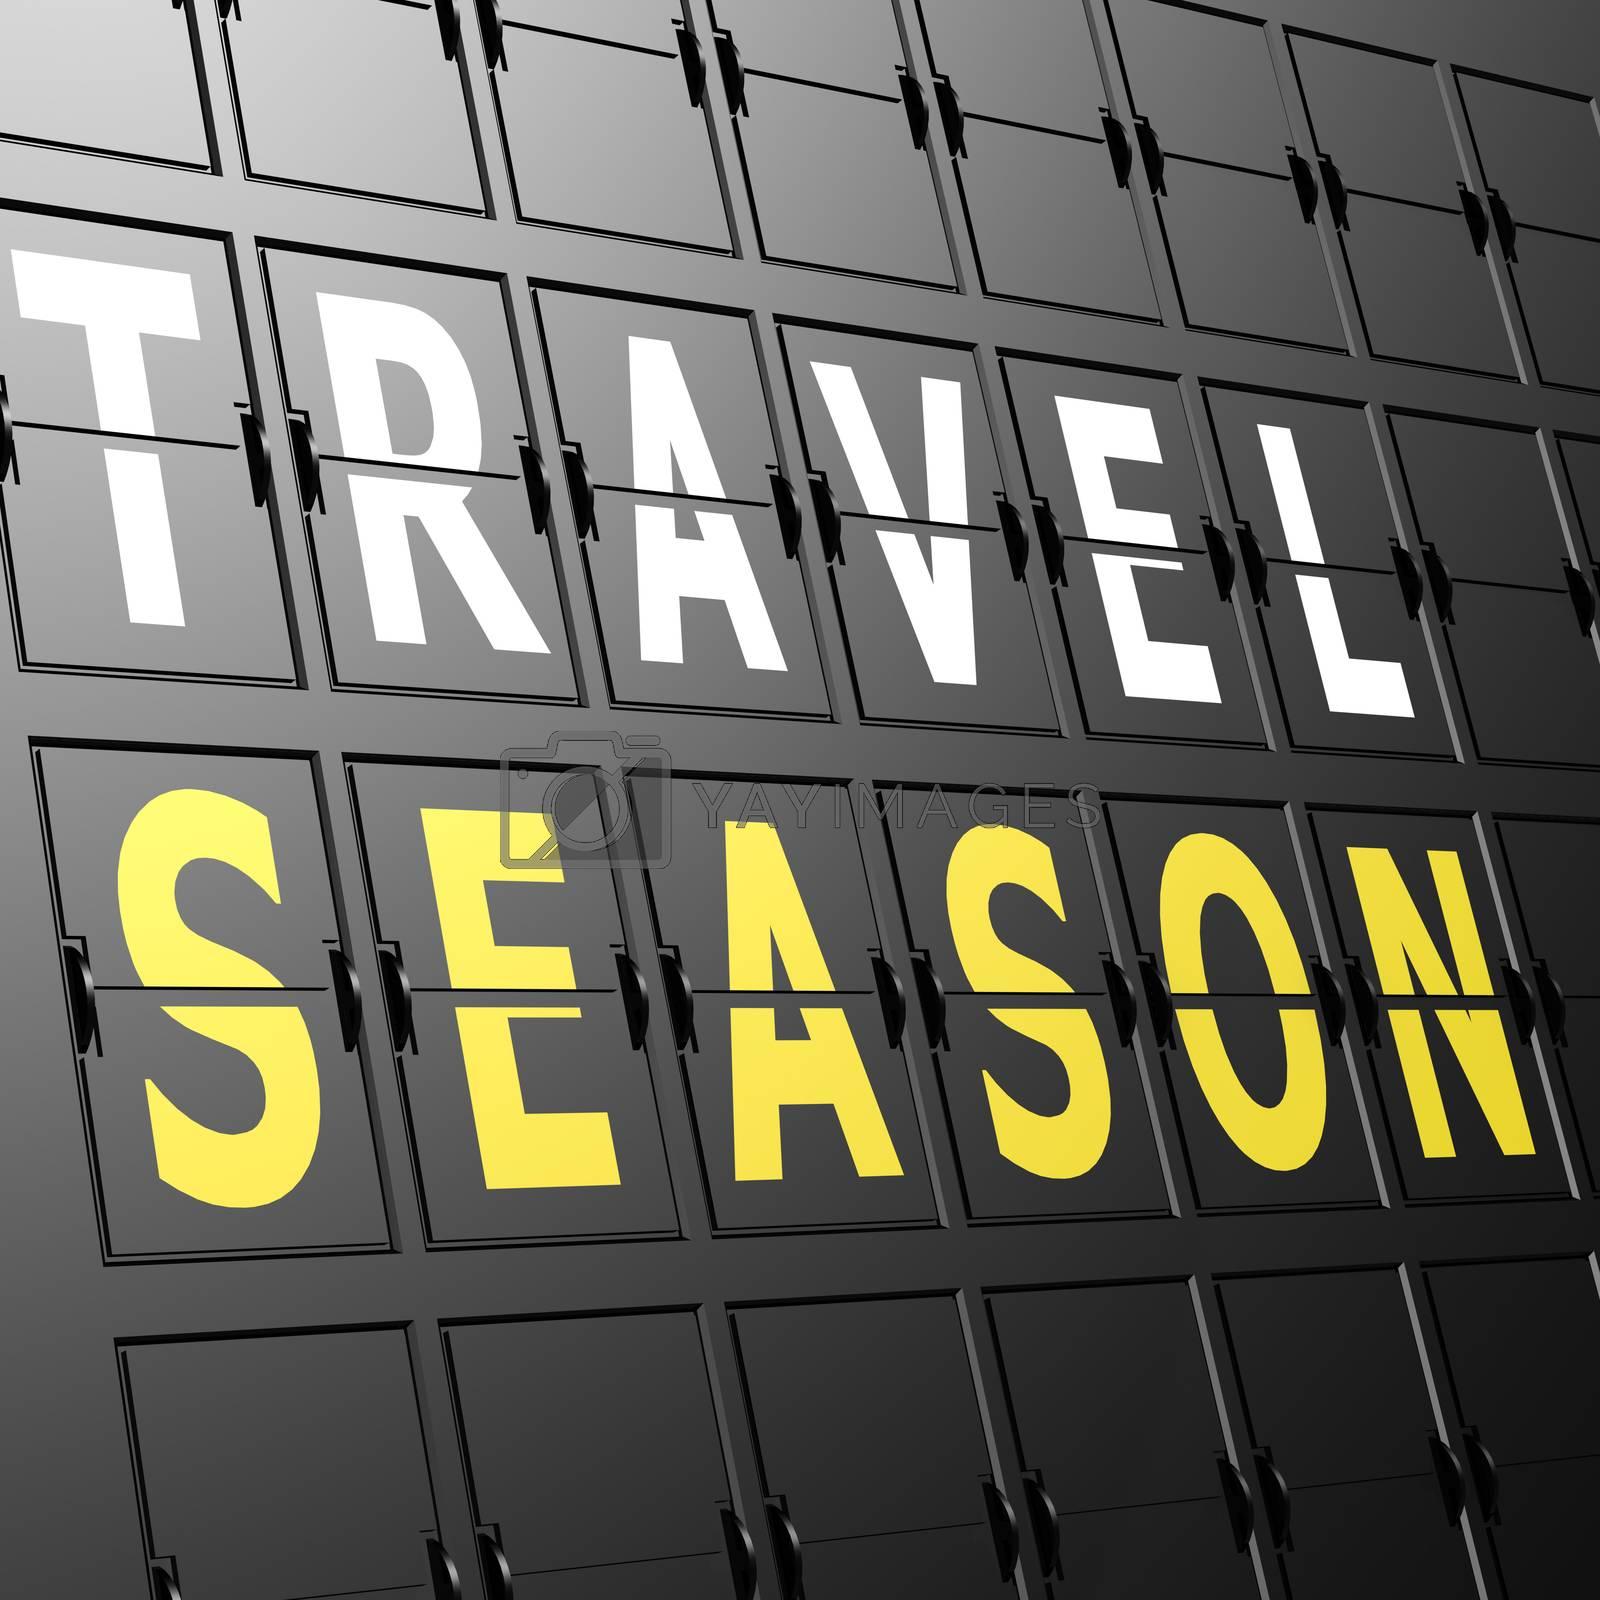 Airport display travel season